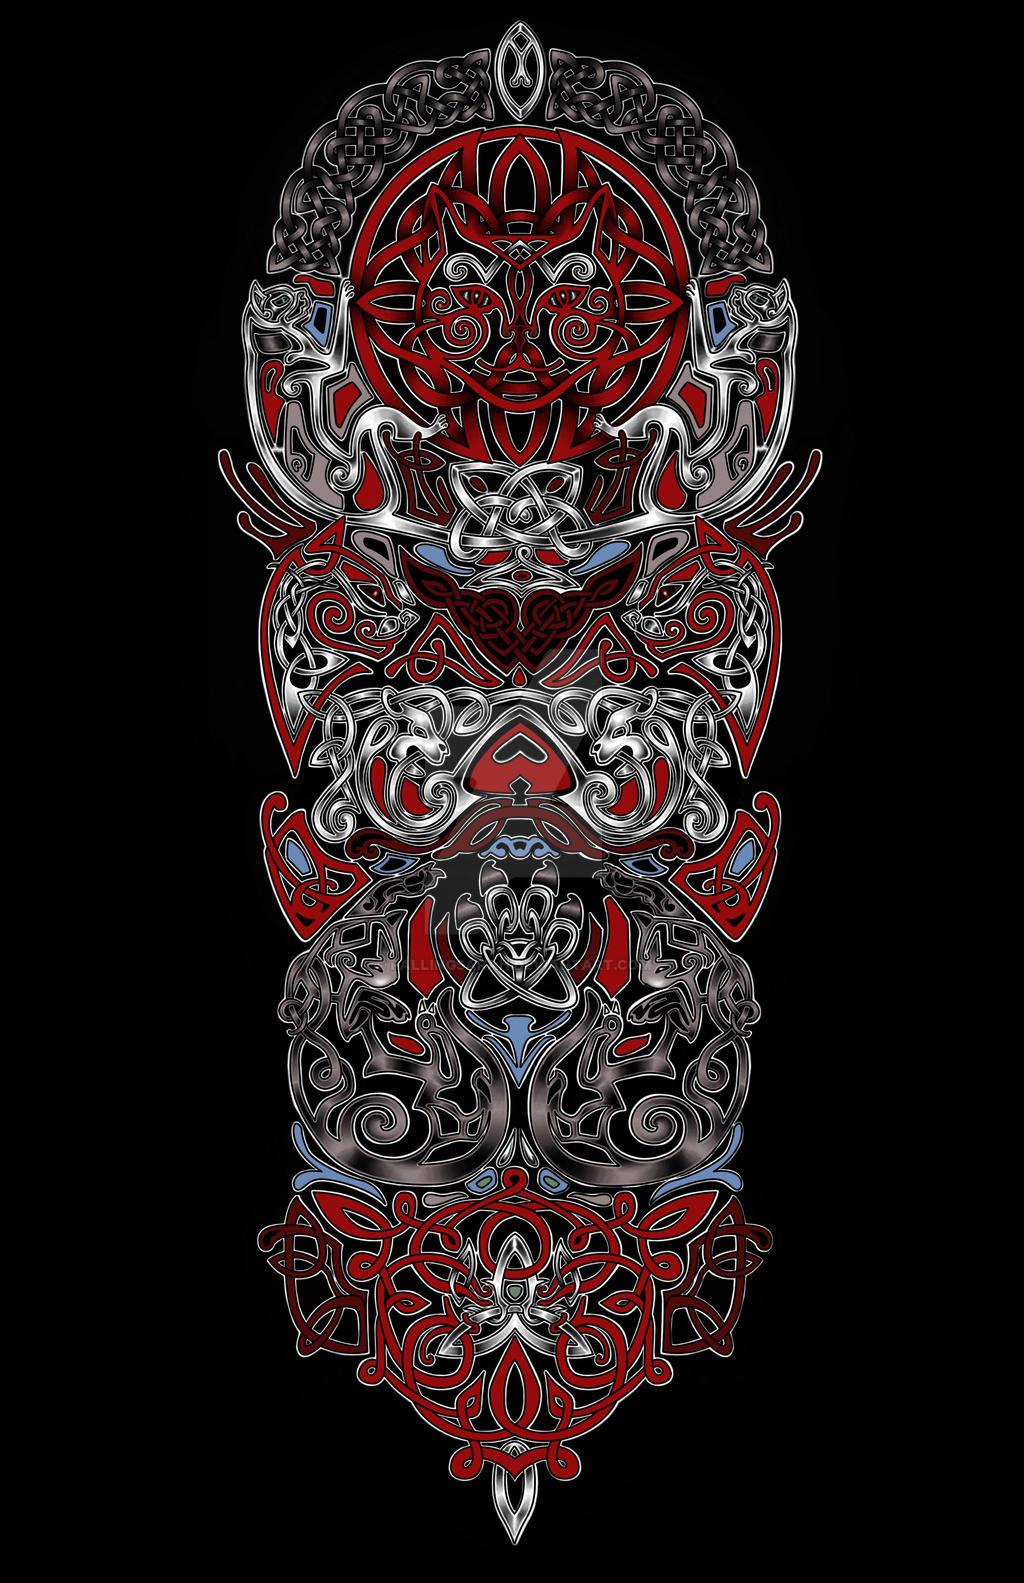 celtic cat tattoo by fallingsarah on deviantart. Black Bedroom Furniture Sets. Home Design Ideas